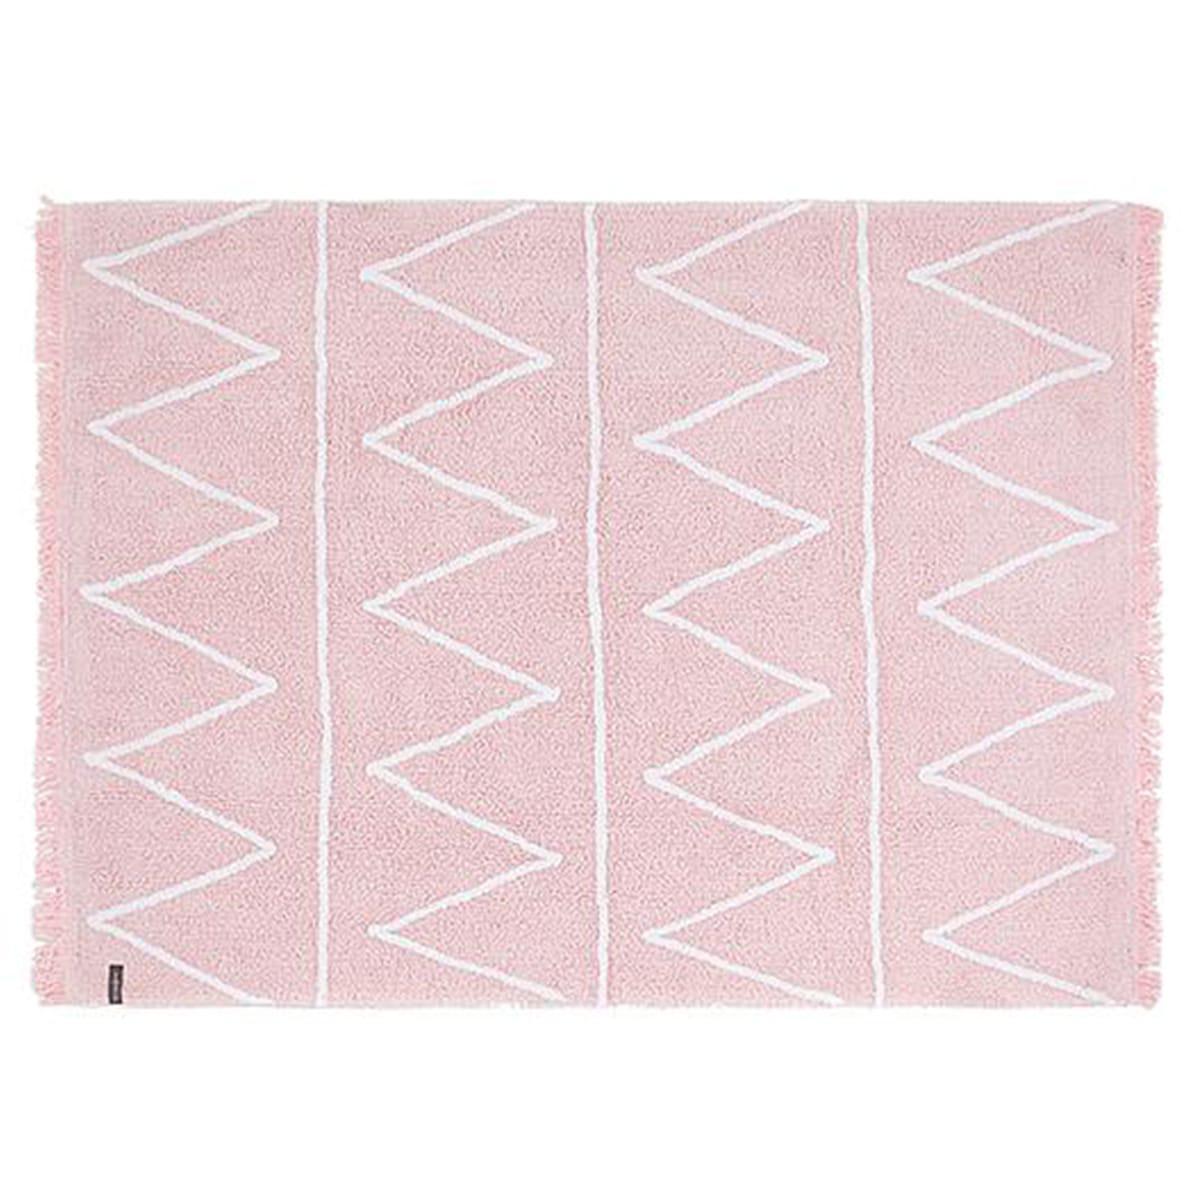 Alfombra 120x160cm HIPPY Lorena Canals pink